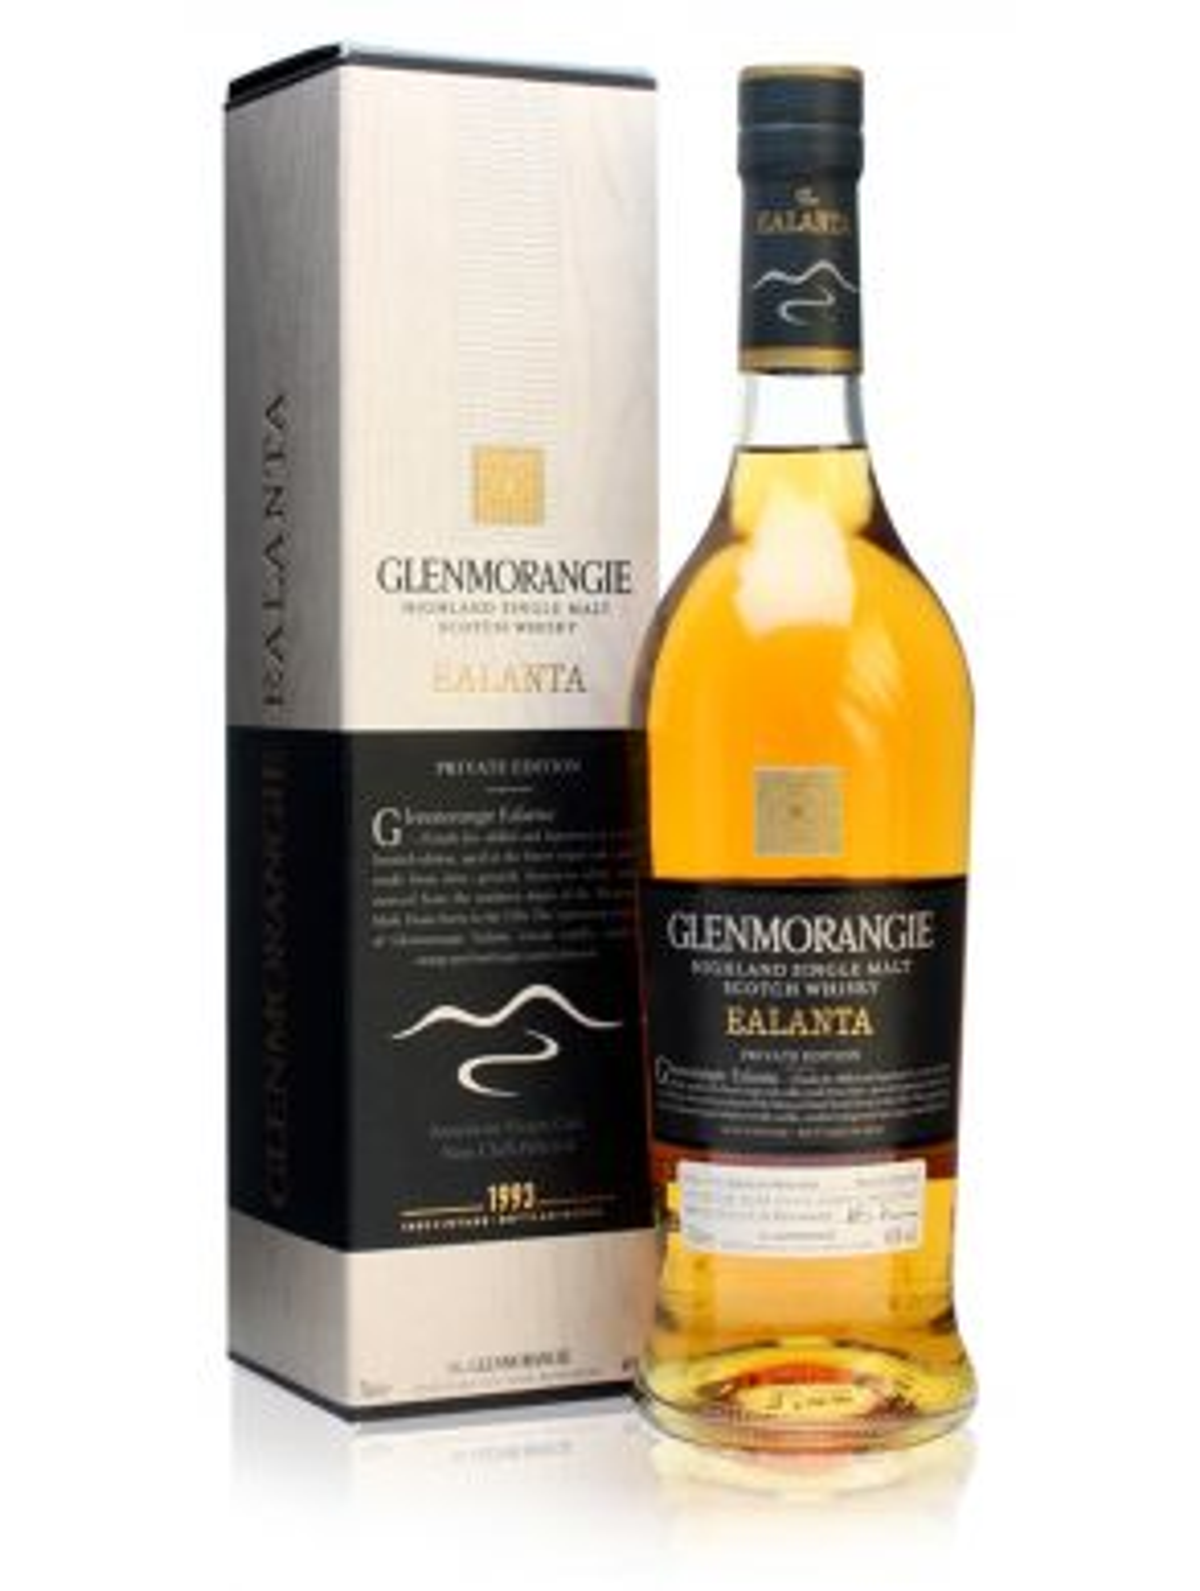 Glenmorangie Ealanta 1993 19 Year Old Malt Whisky Private Edition 70cl